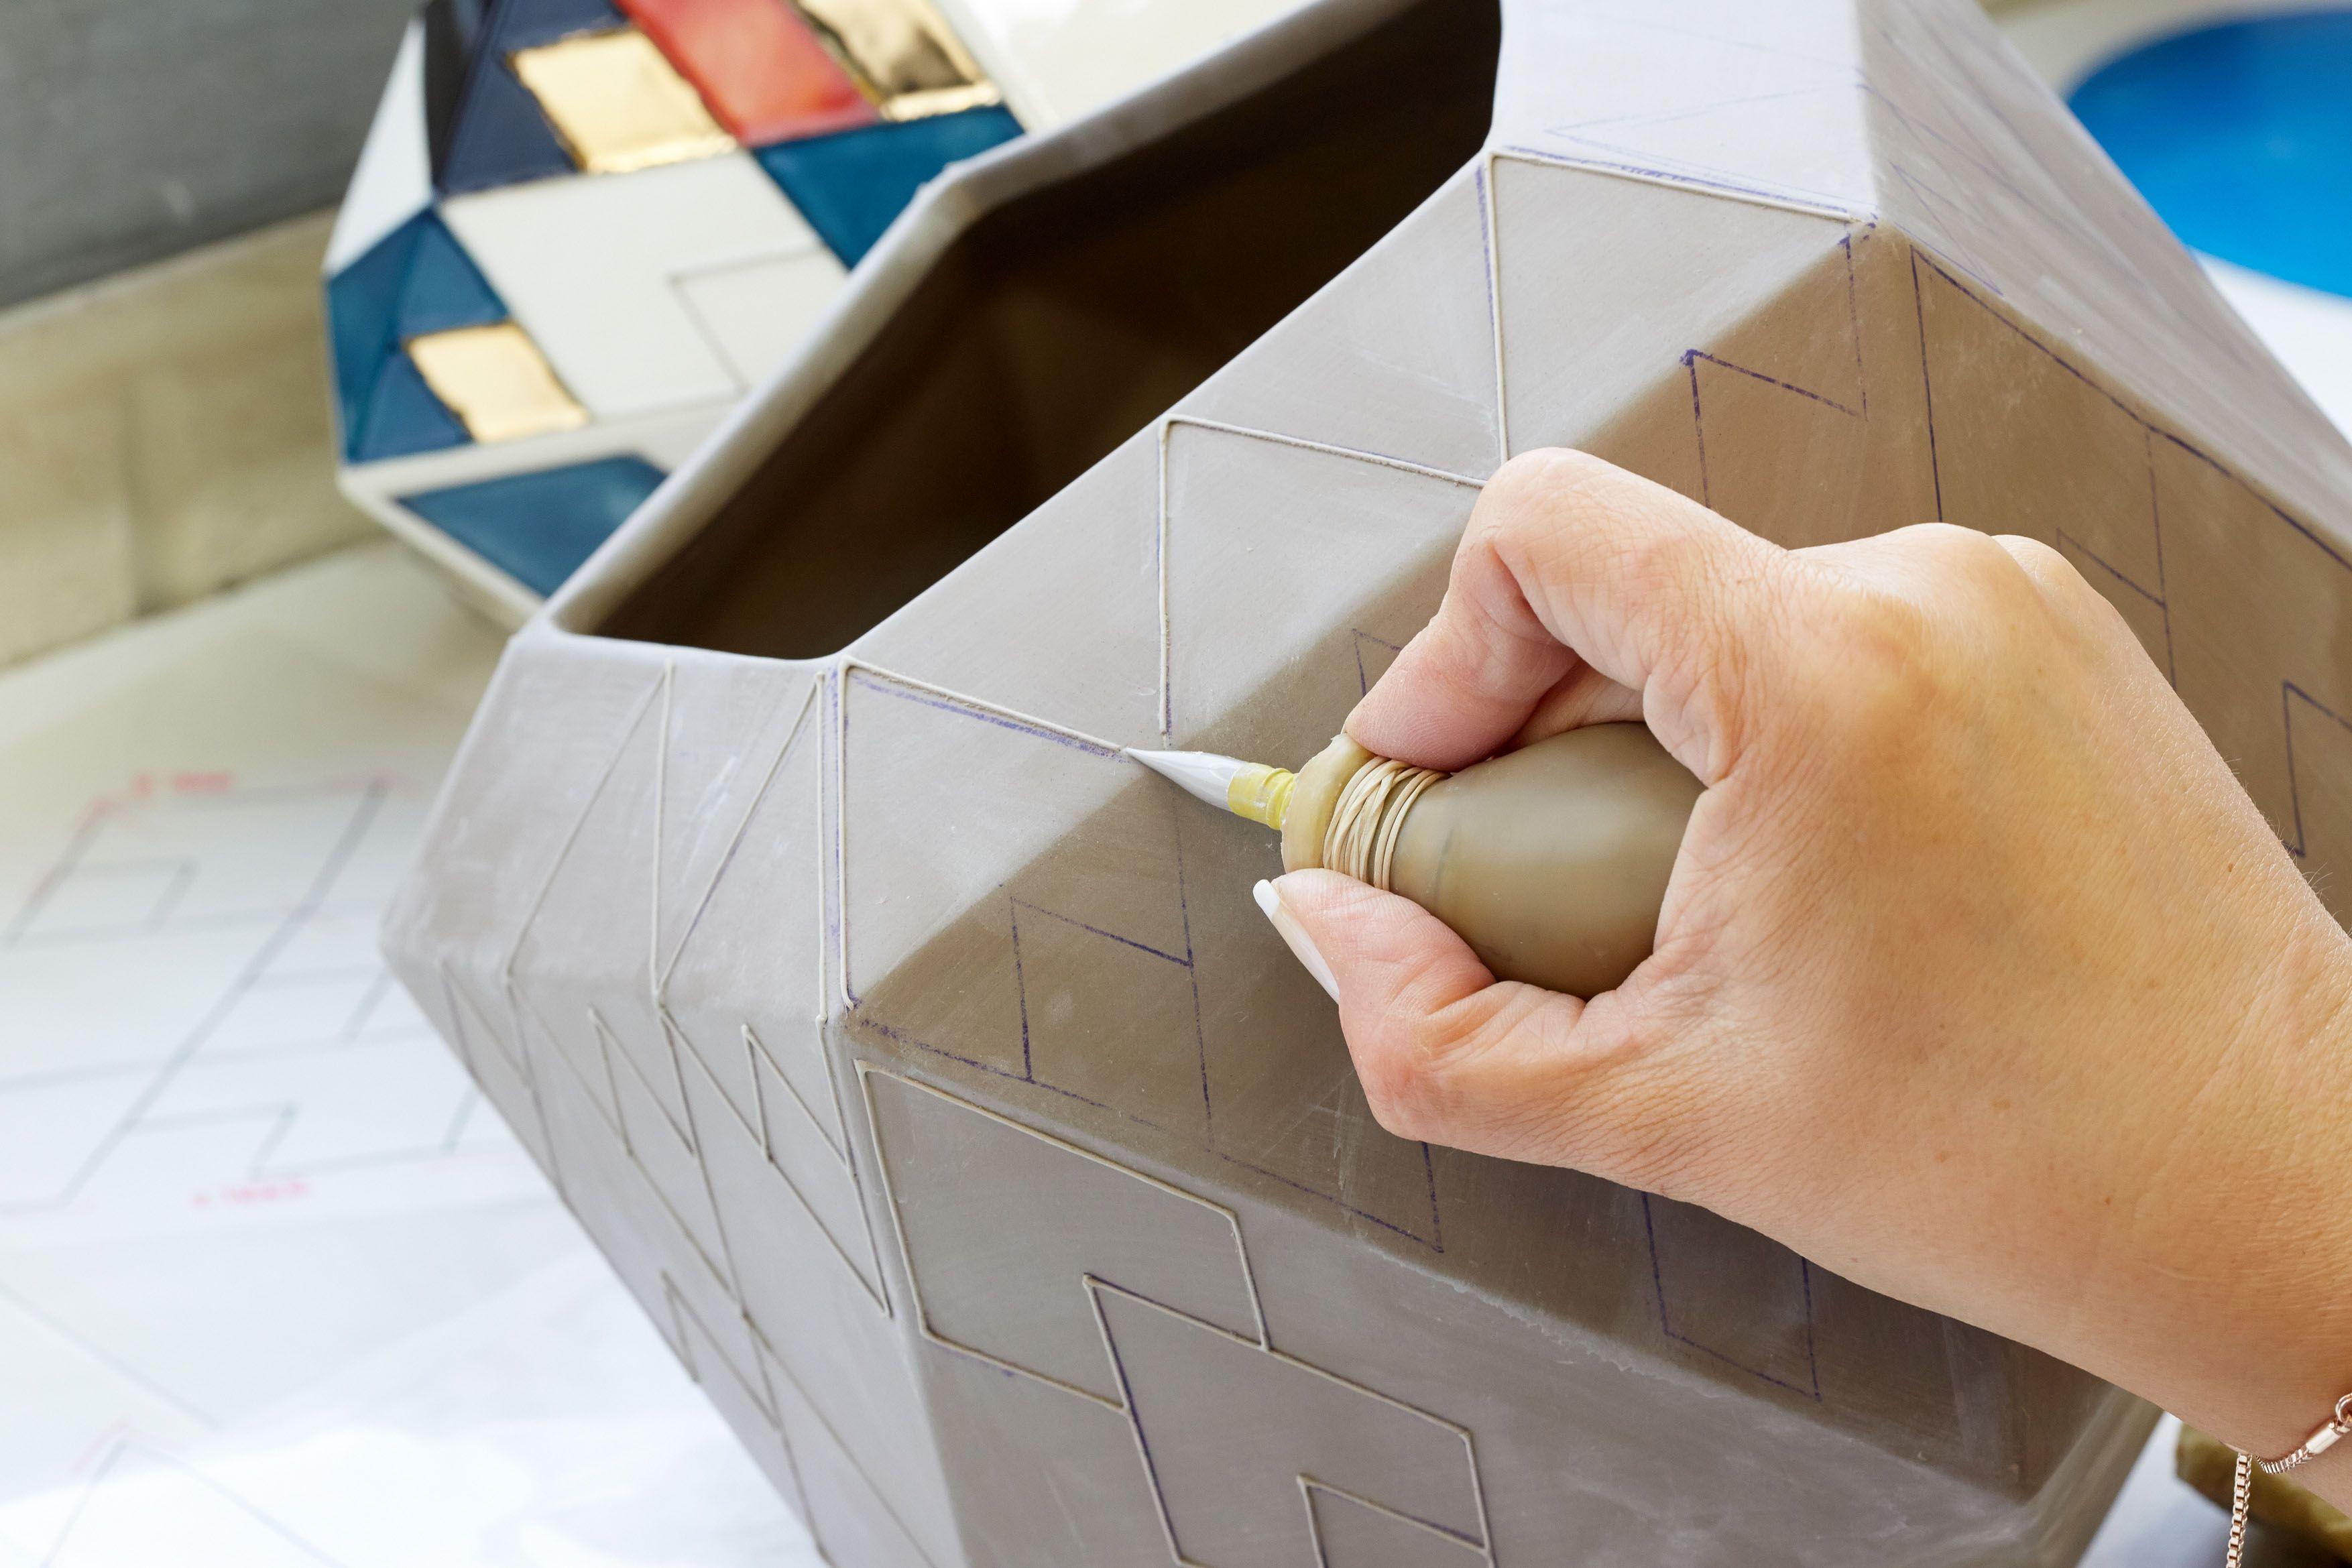 Pin on Craft - Felt - Surface design